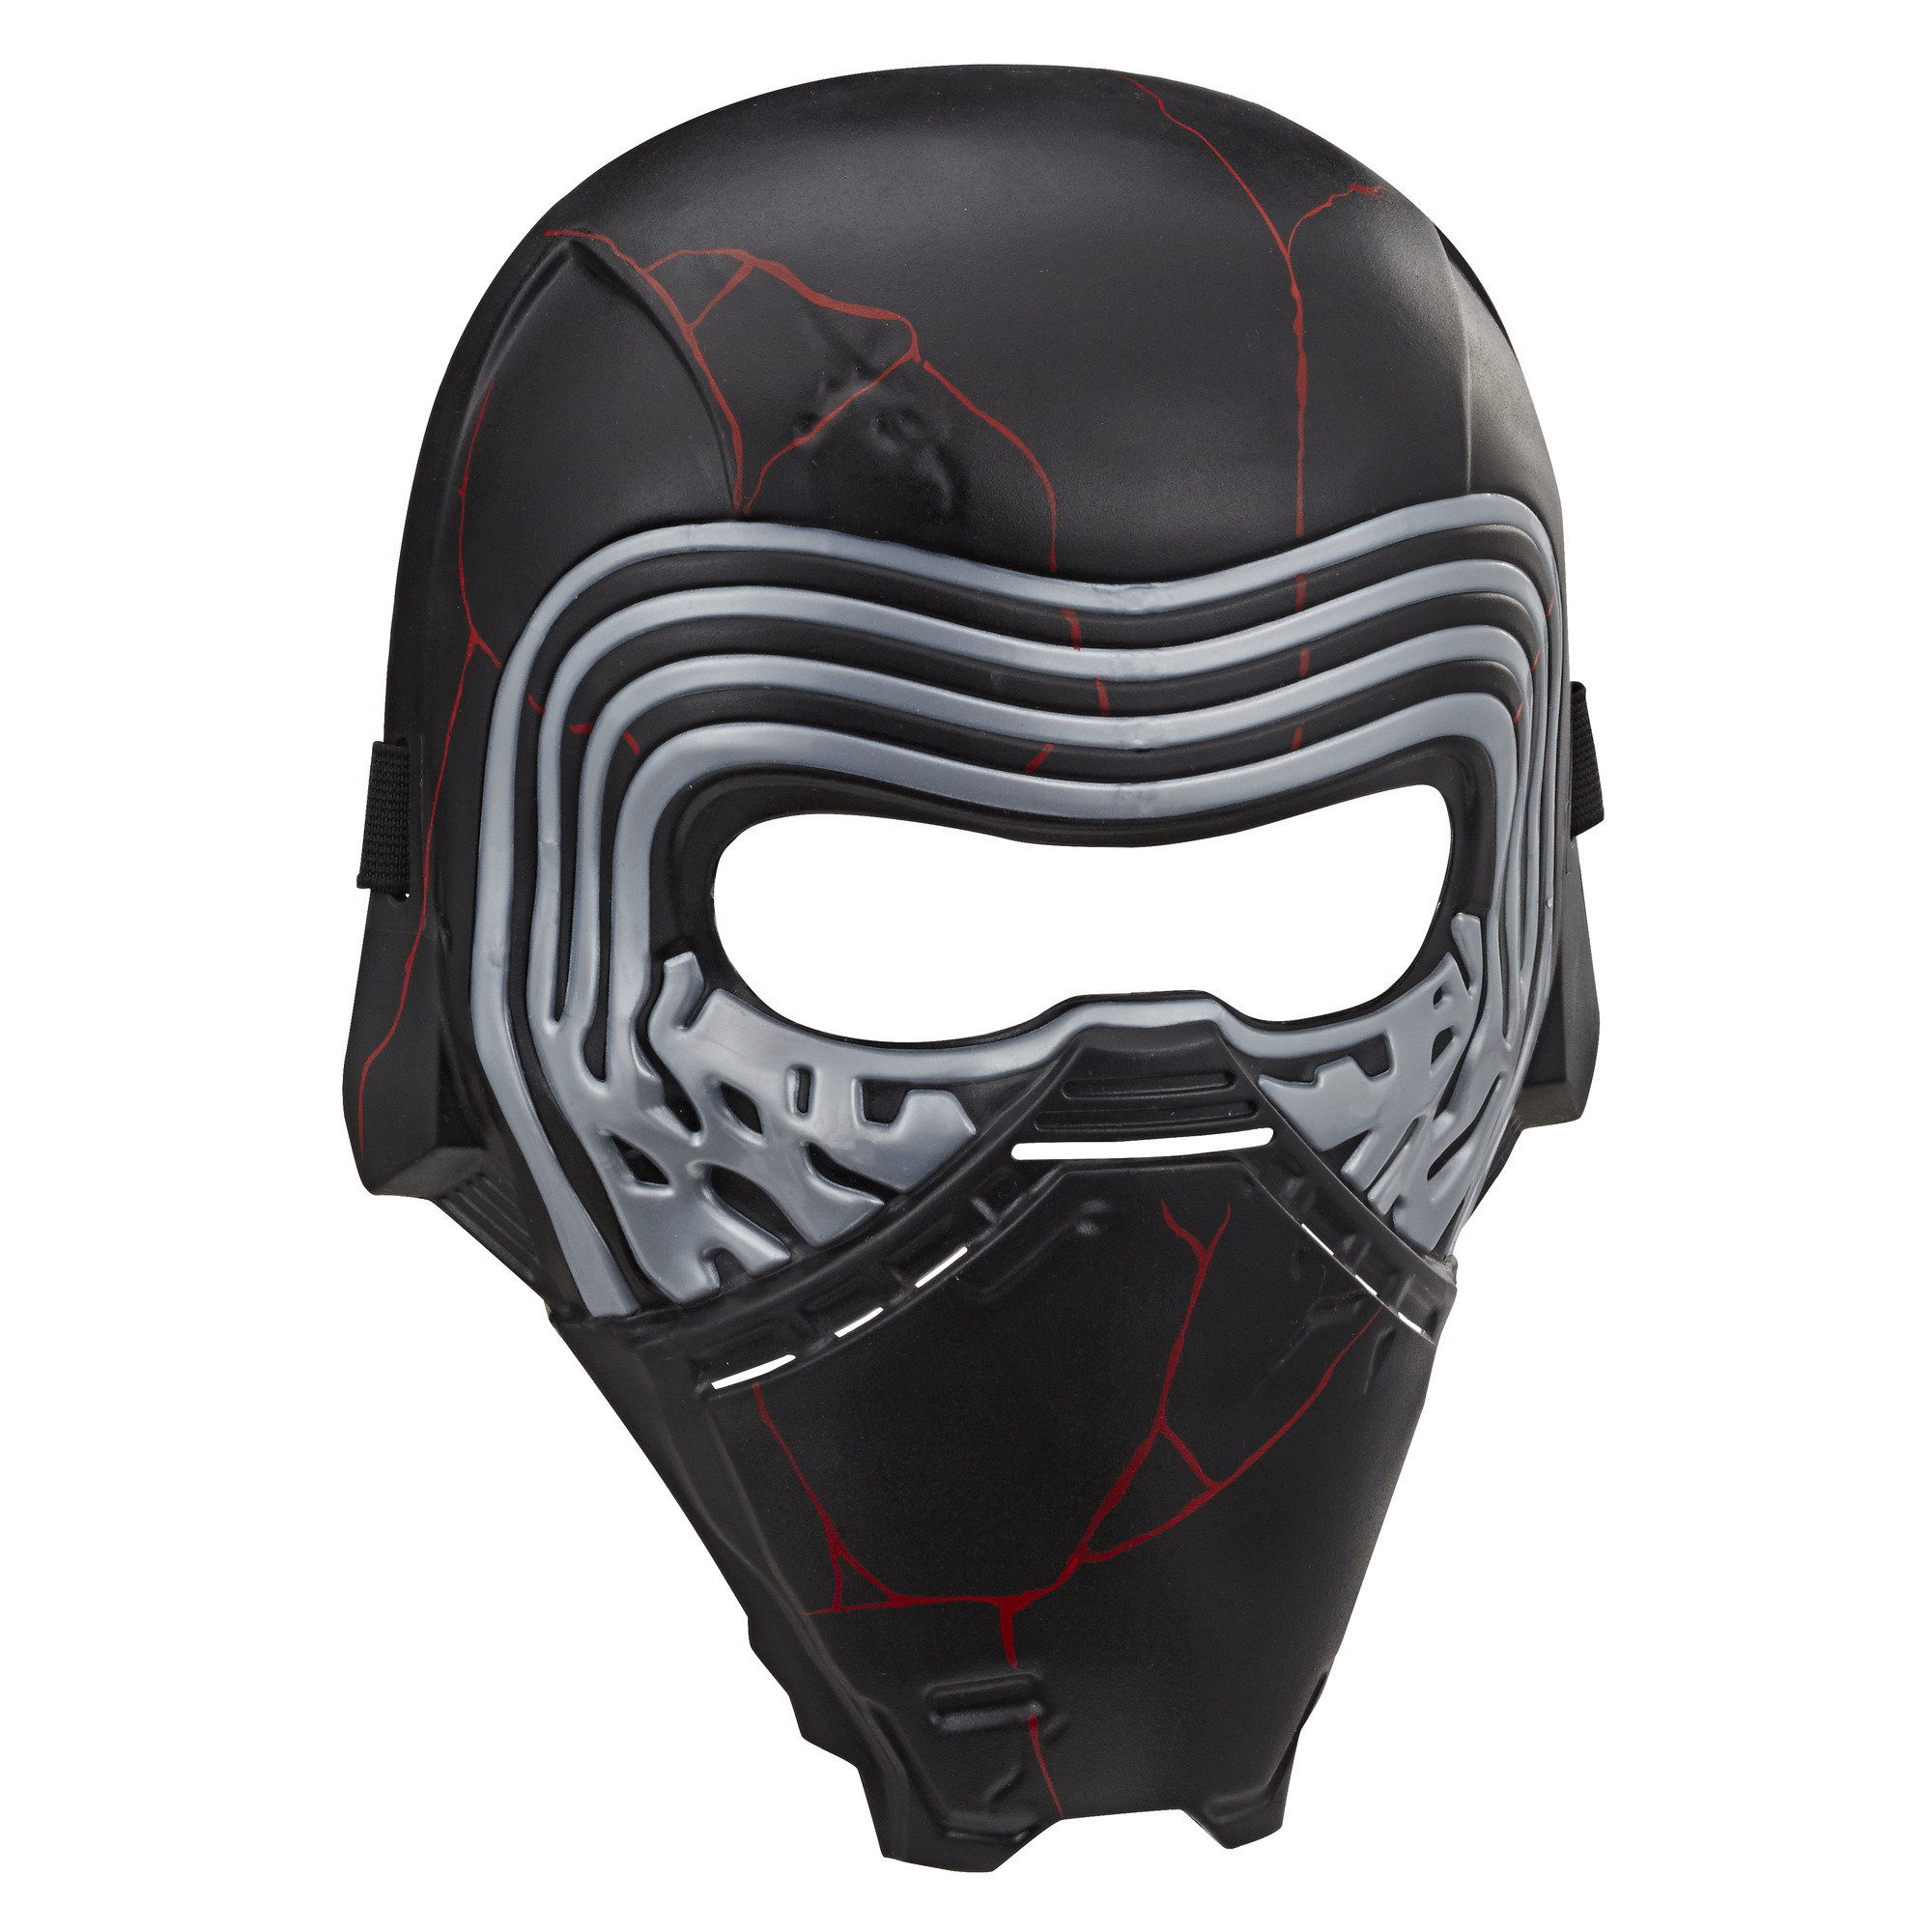 Star Wars The Rise Of Skywalker Kylo Ren Mask For Kids Roleplay 630509867387 Ebay